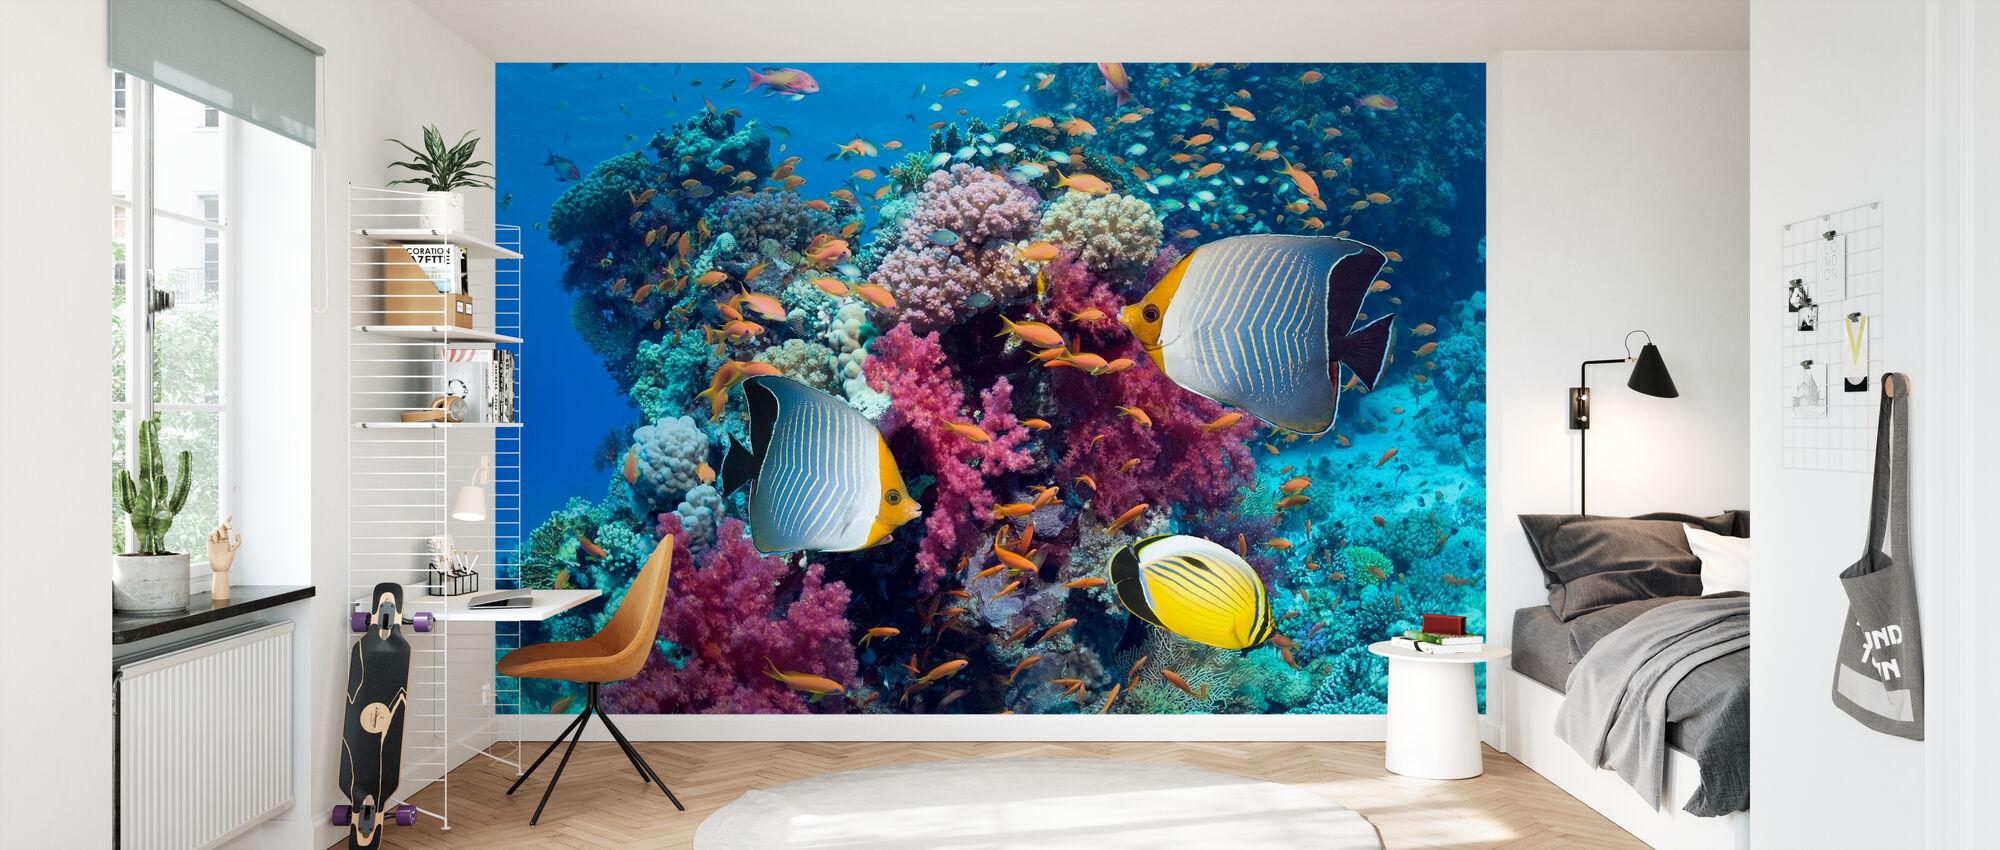 Butterfly Fish - Wallpaper - Kids Room